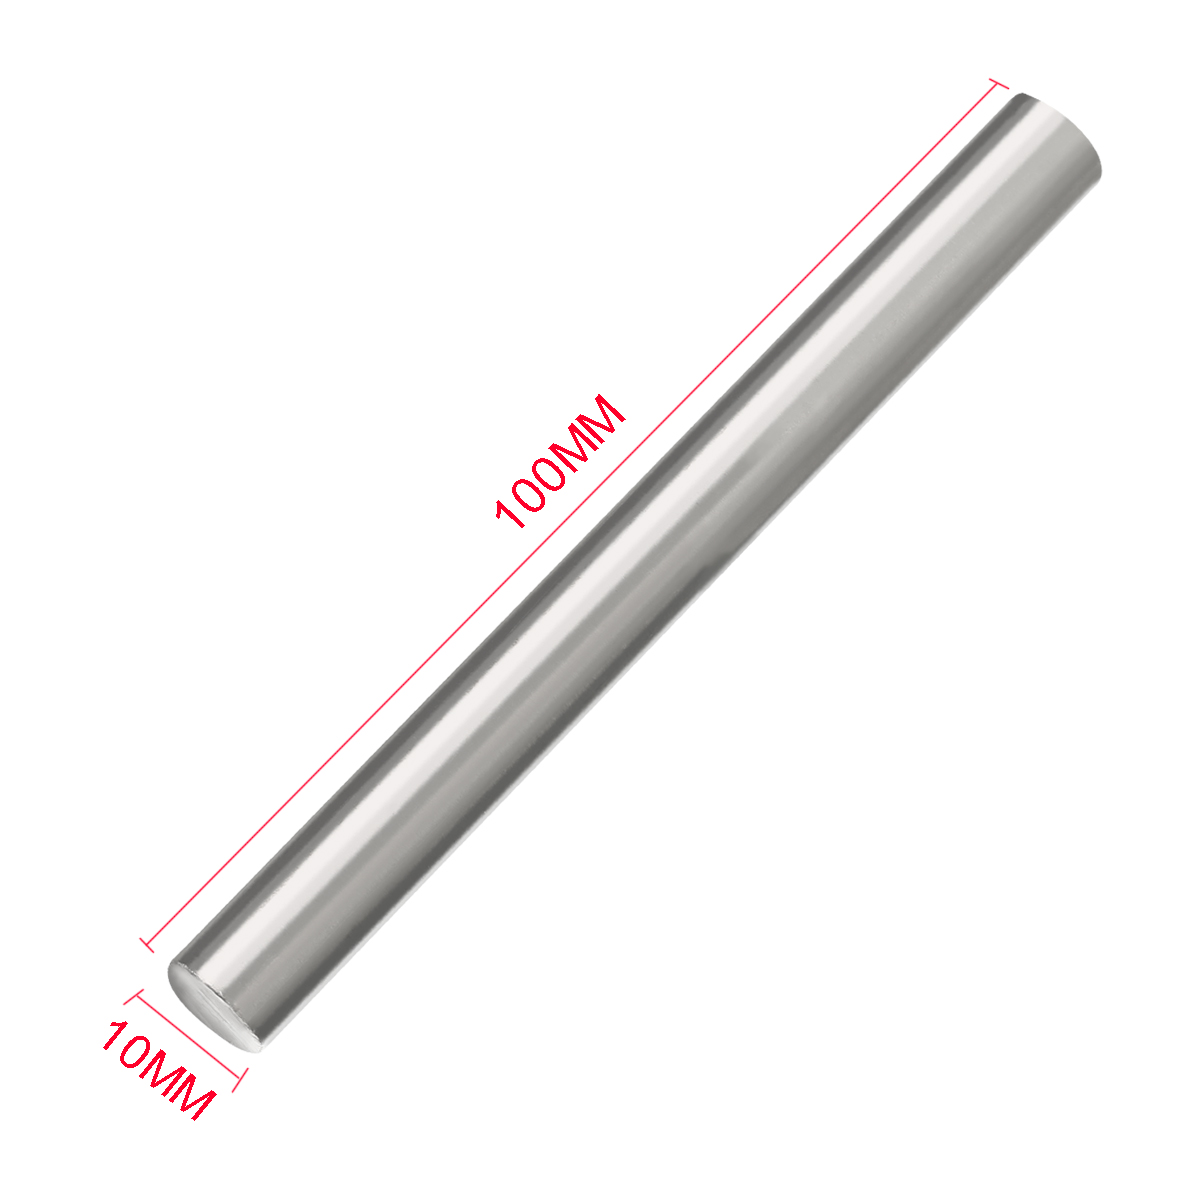 1pc 10mmx100mm Titanium Rod Heat Resistant Ti Grade 2 GR2 Metal Shaft Round Bar Mayitr(China)